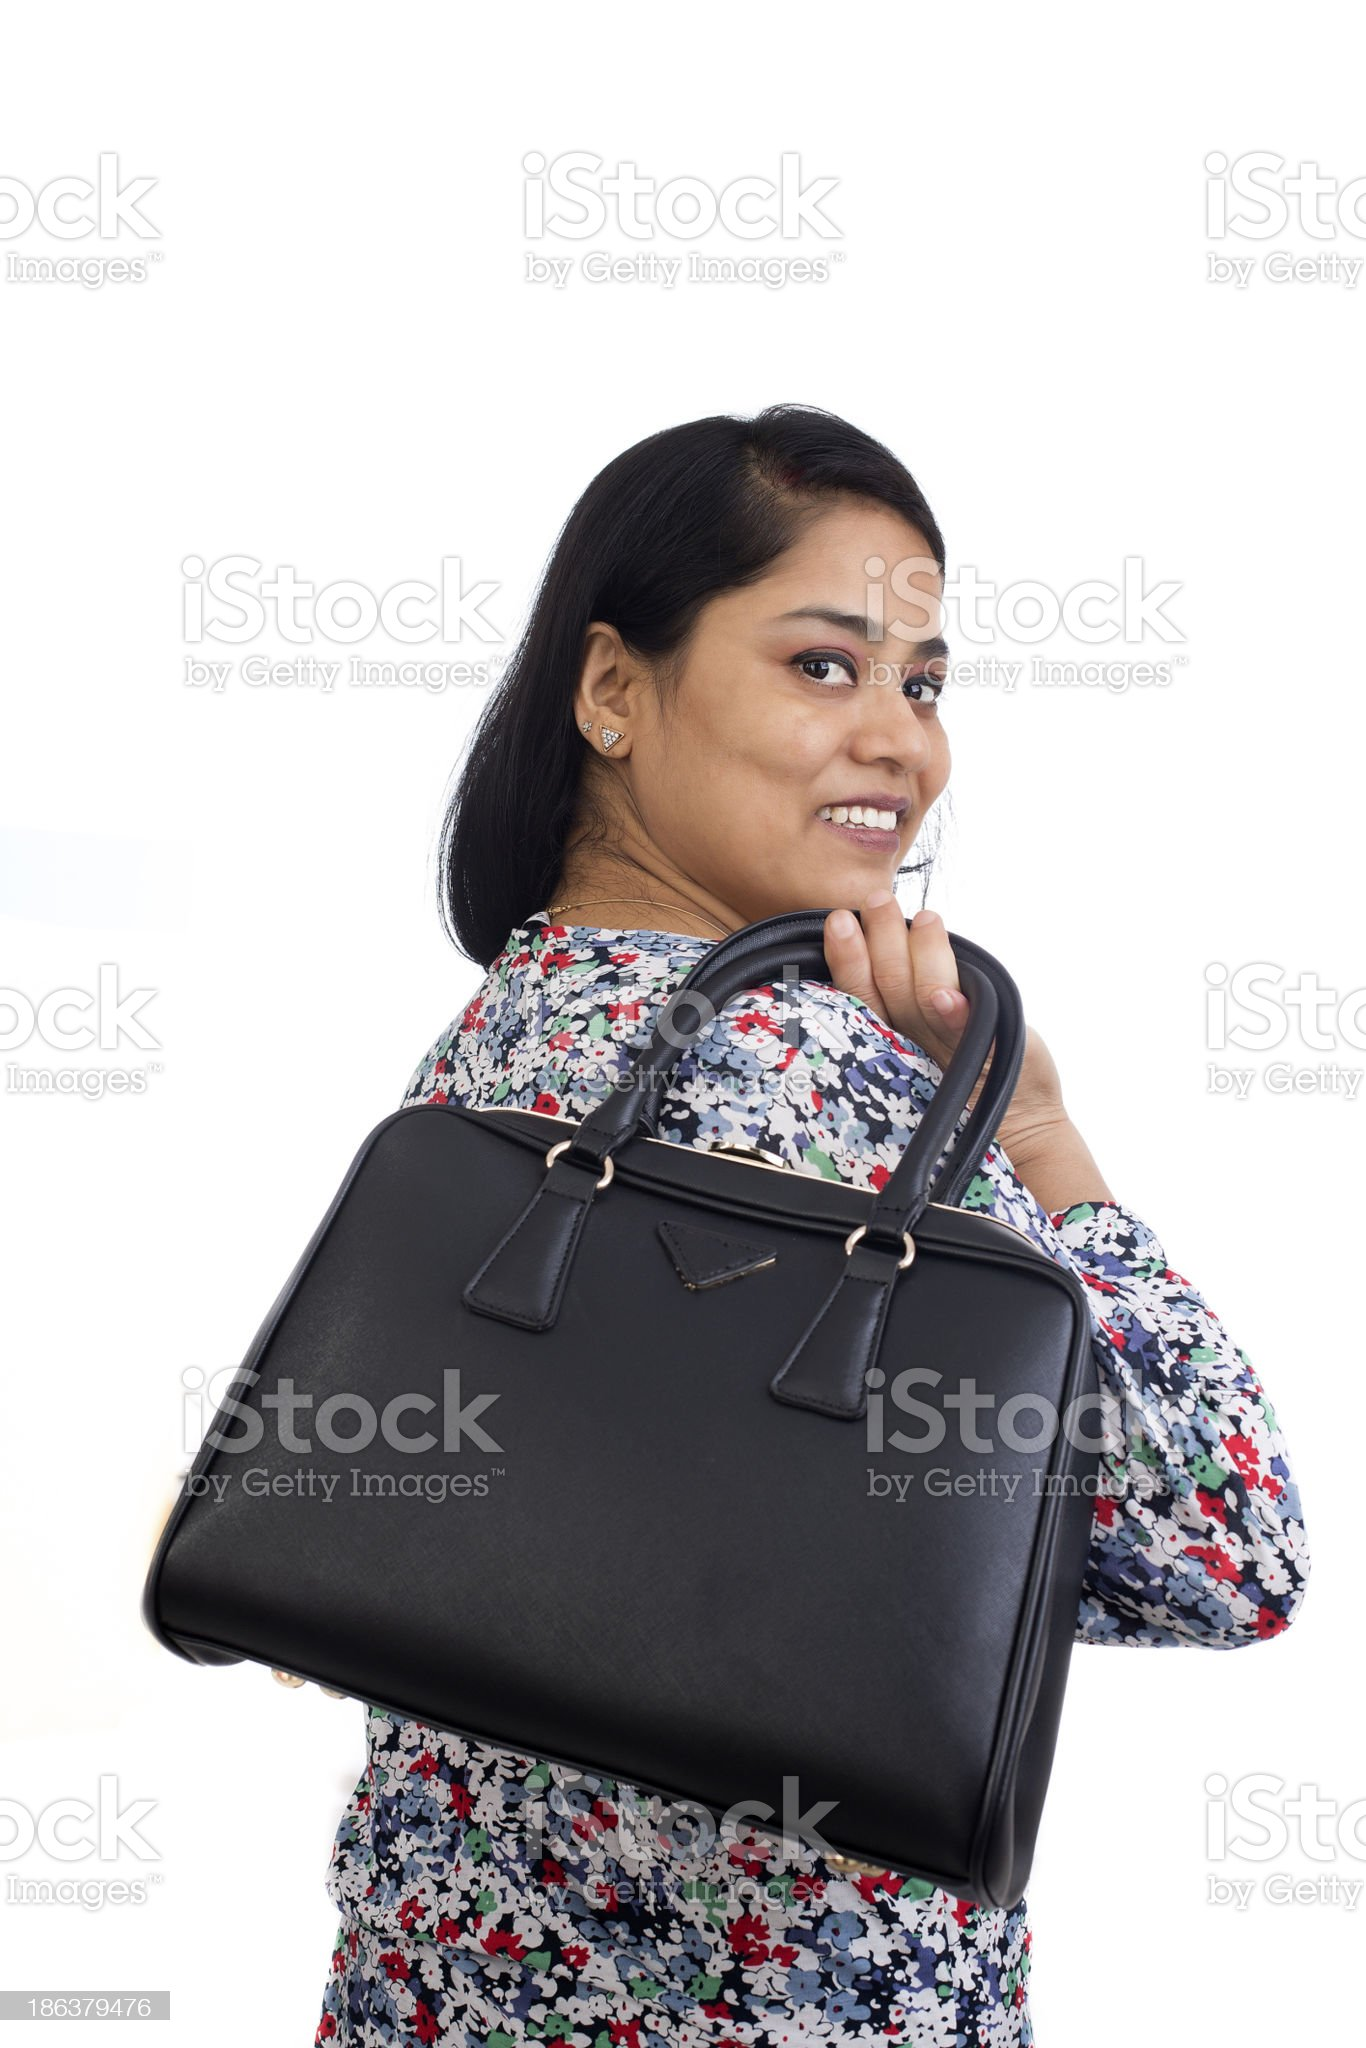 Closeup of a young Asian Indian woman carrying her handbag. royalty-free stock photo